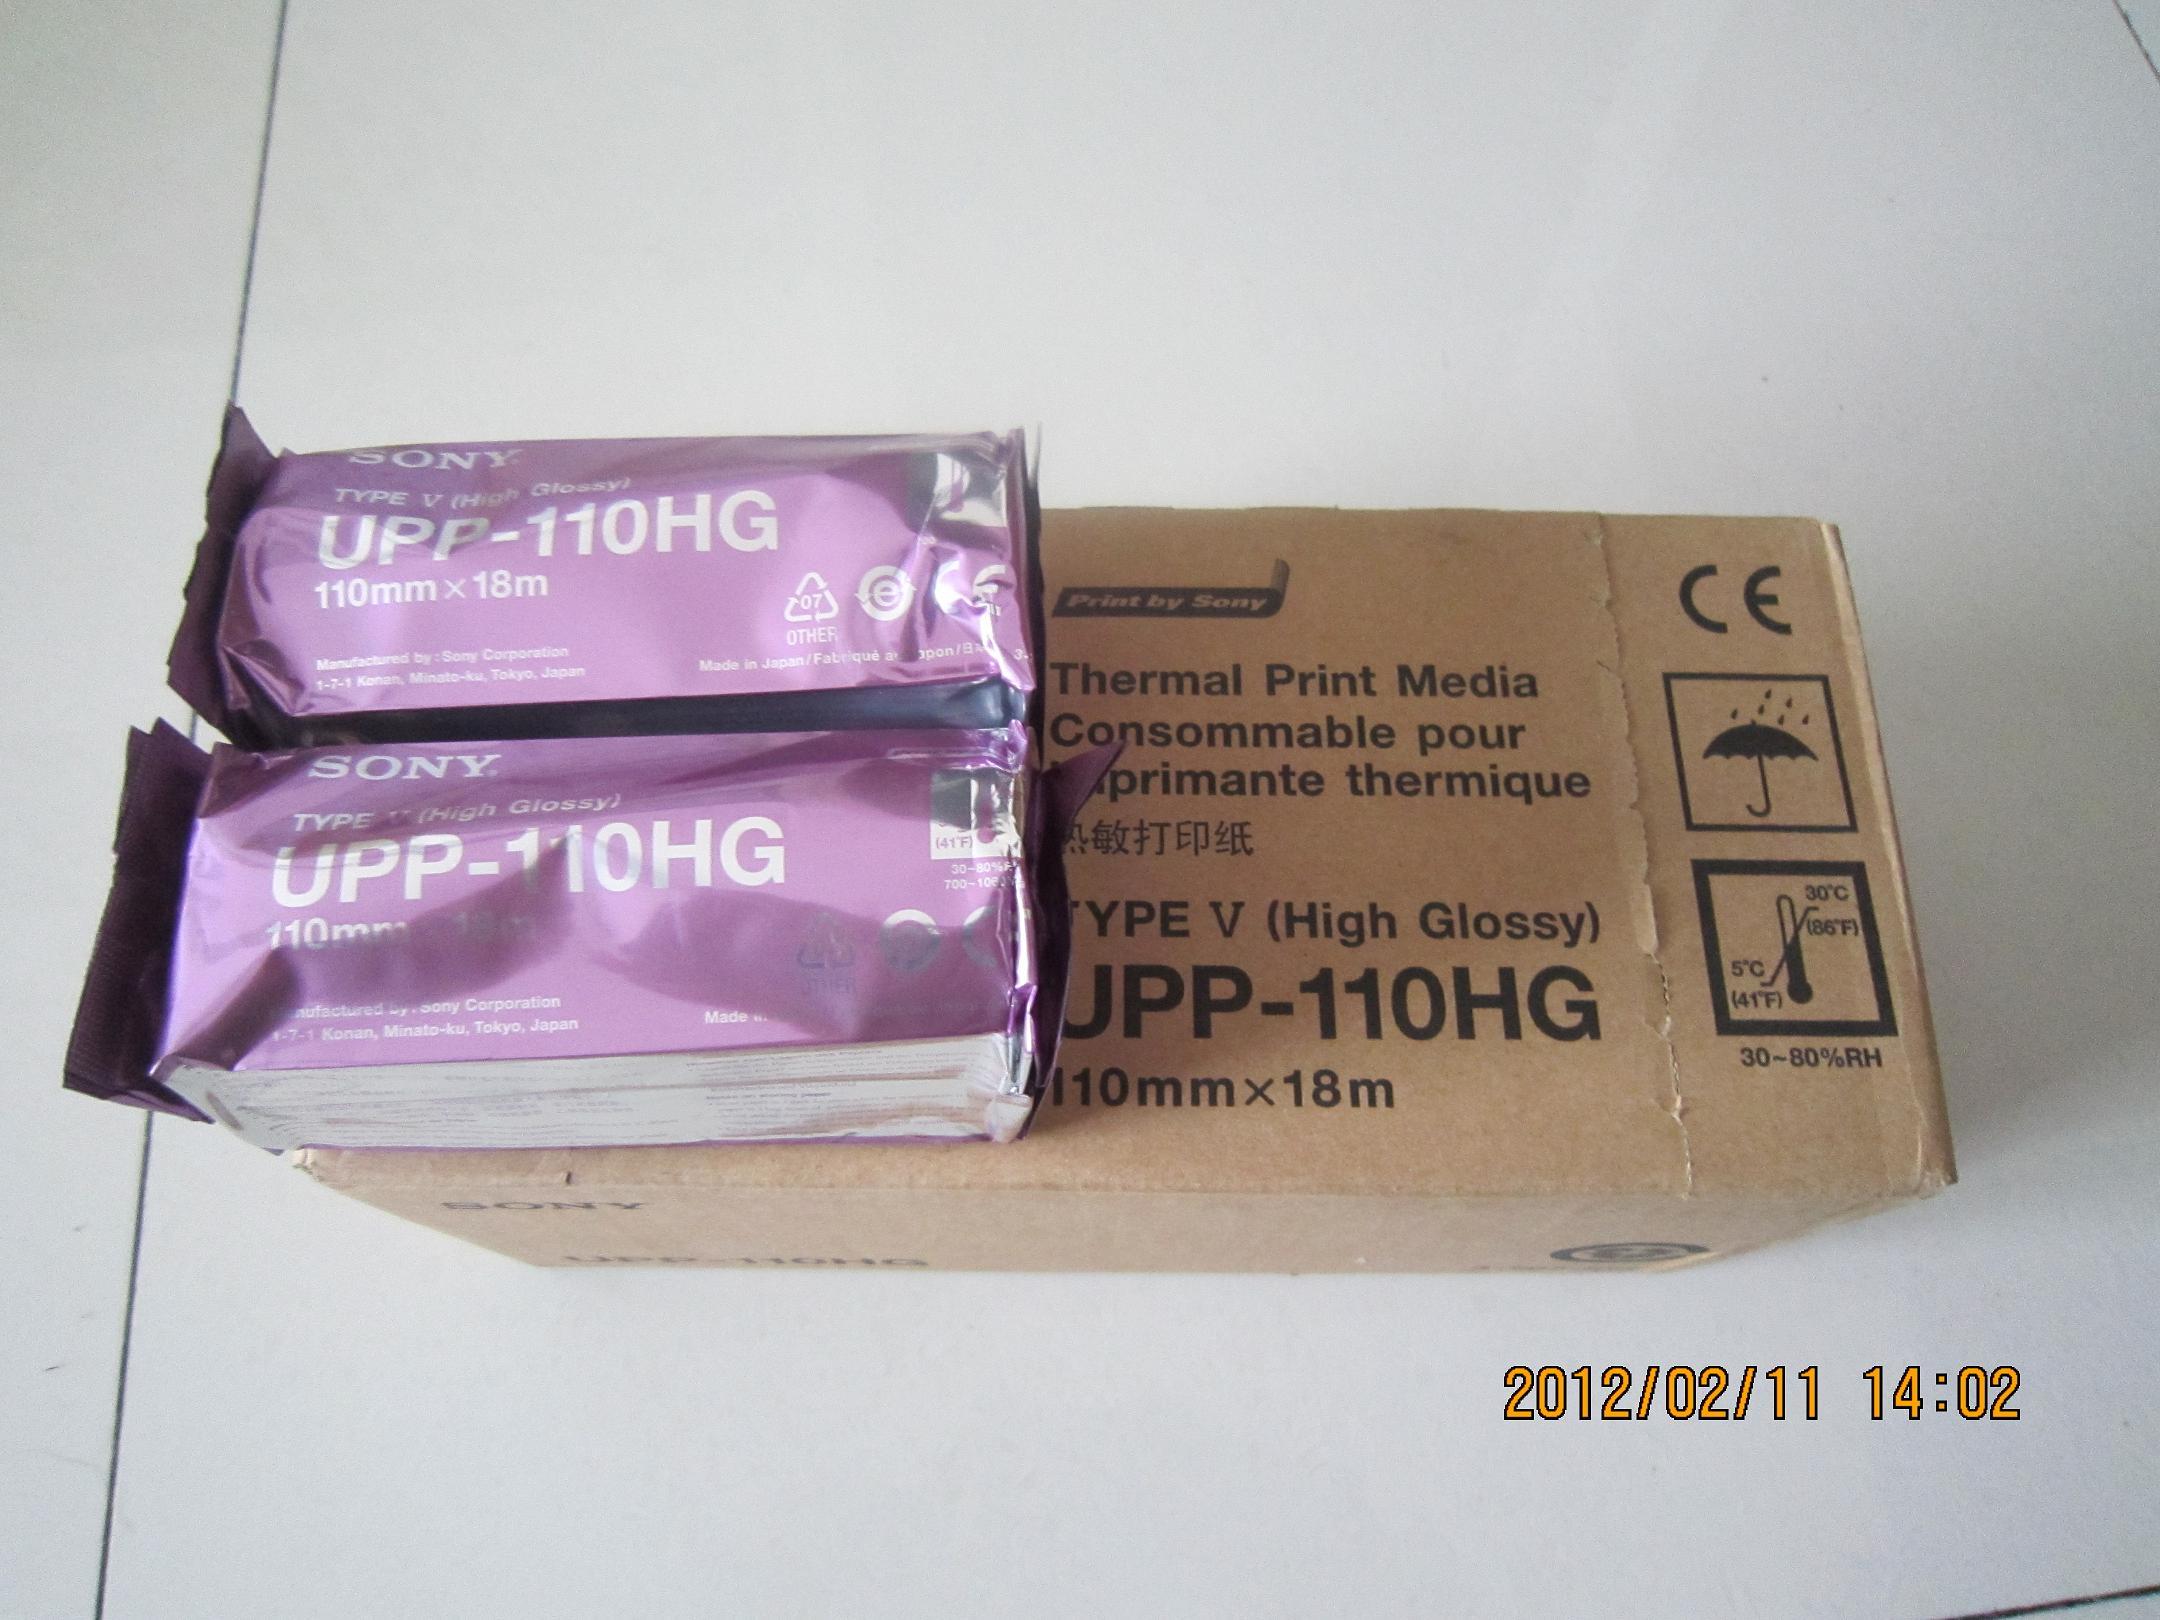 SONY UPP-110HG,Sony High Glossy paper,ultrasound printer paper